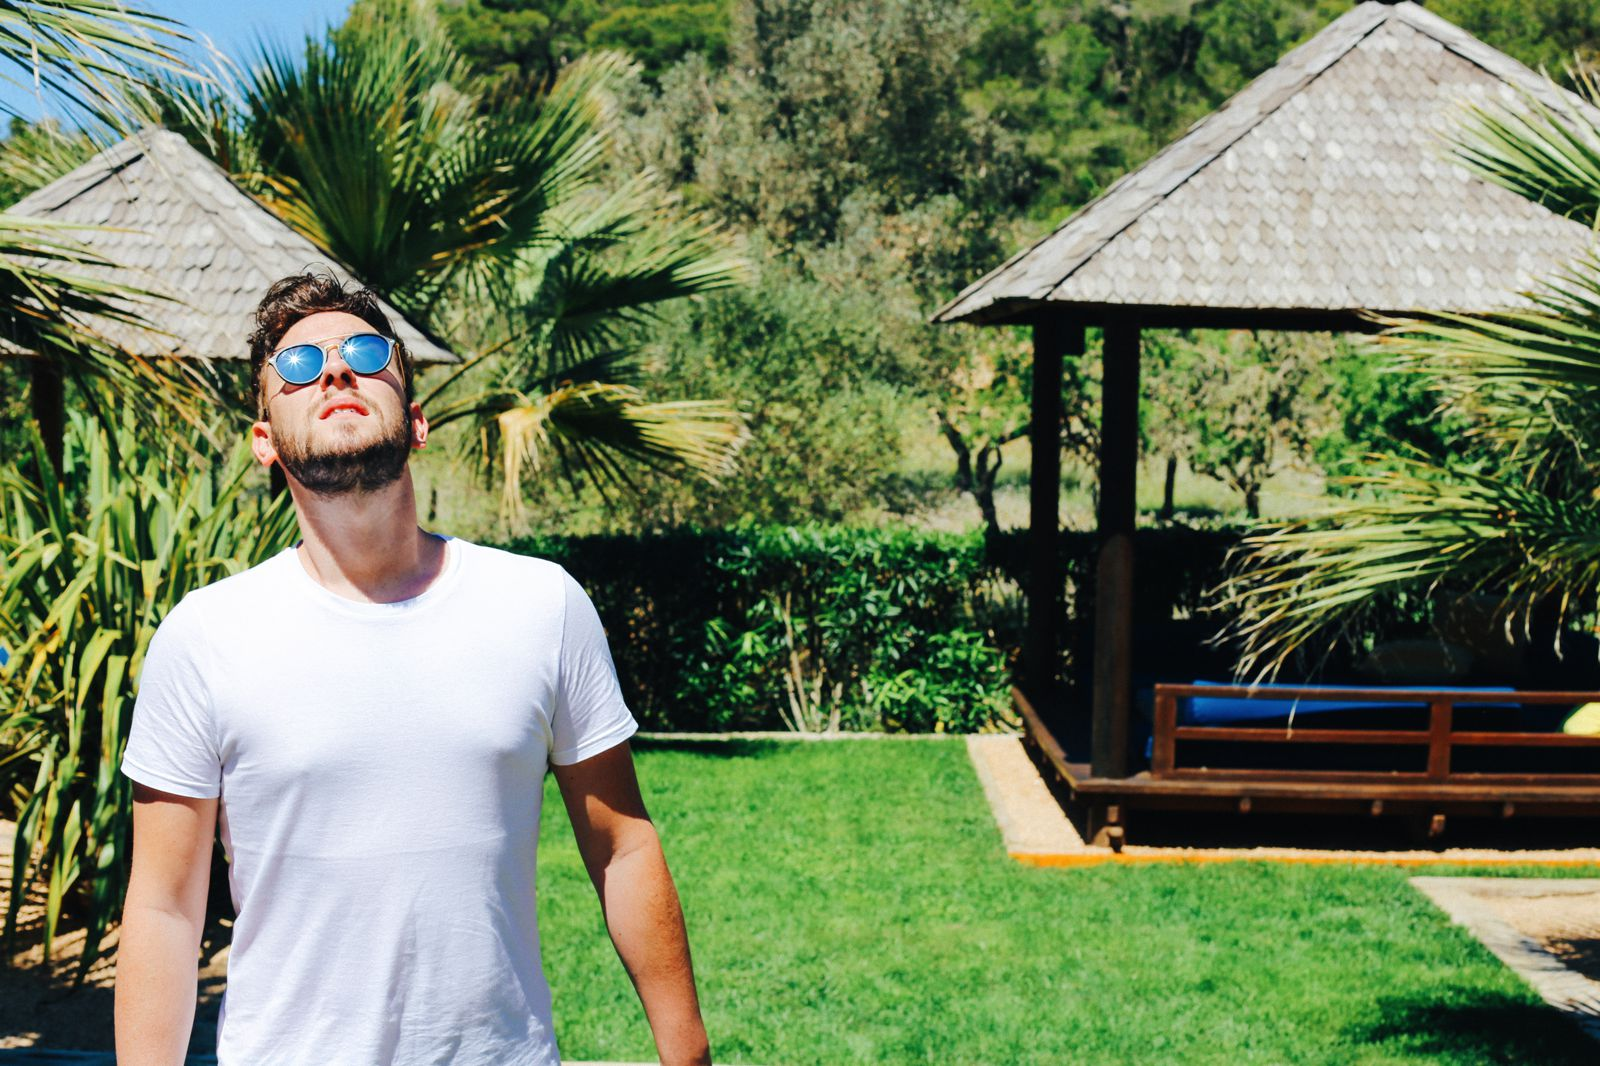 Ibiza Summer Fun In The Sun with Kapten & Sons (12)